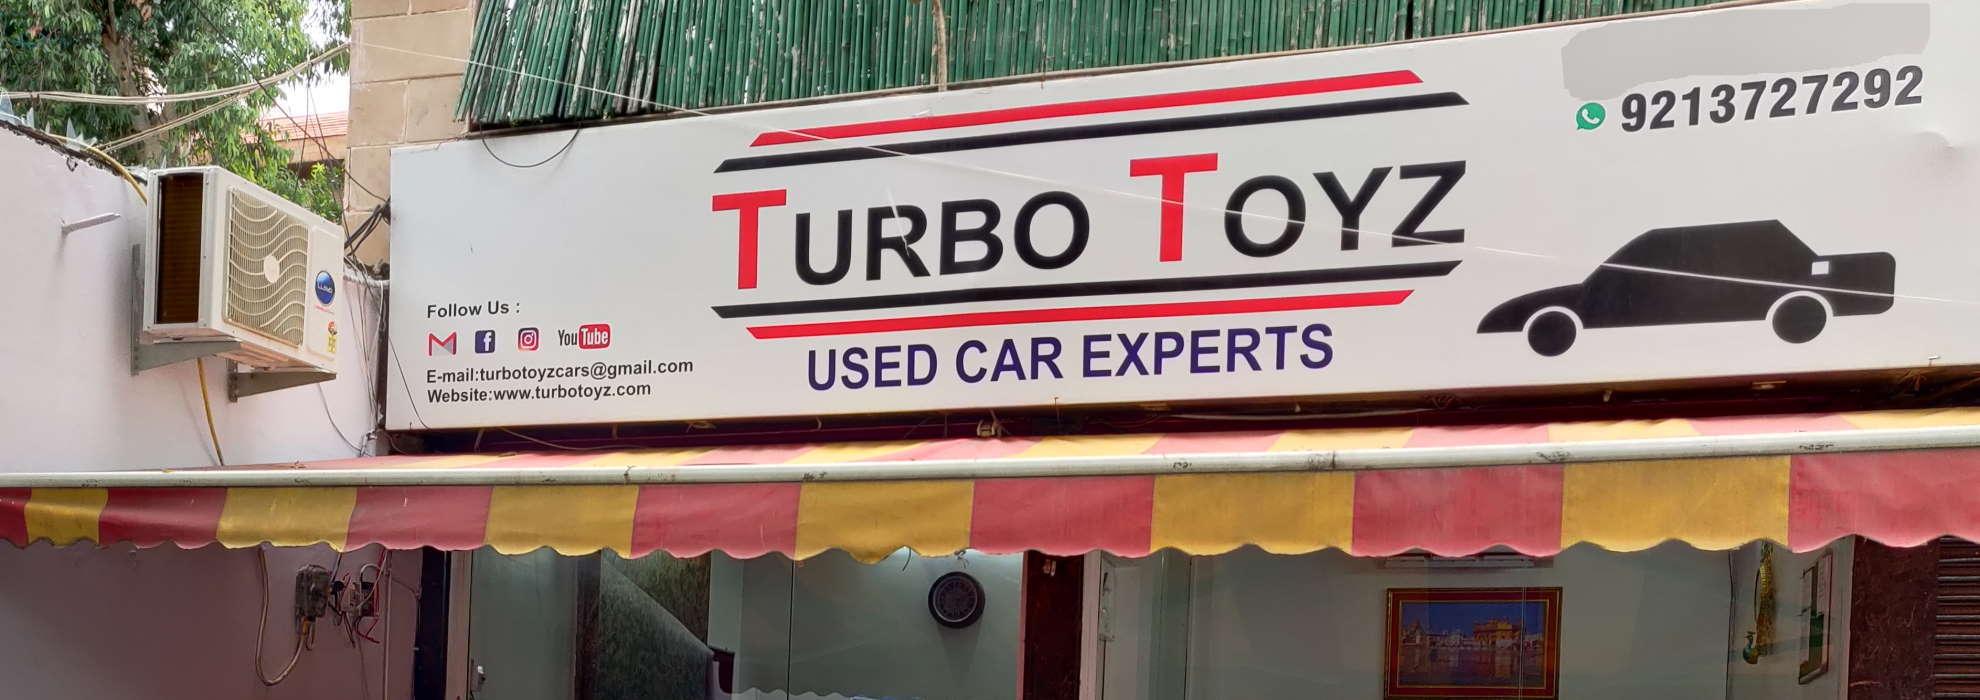 Turbo Toyz